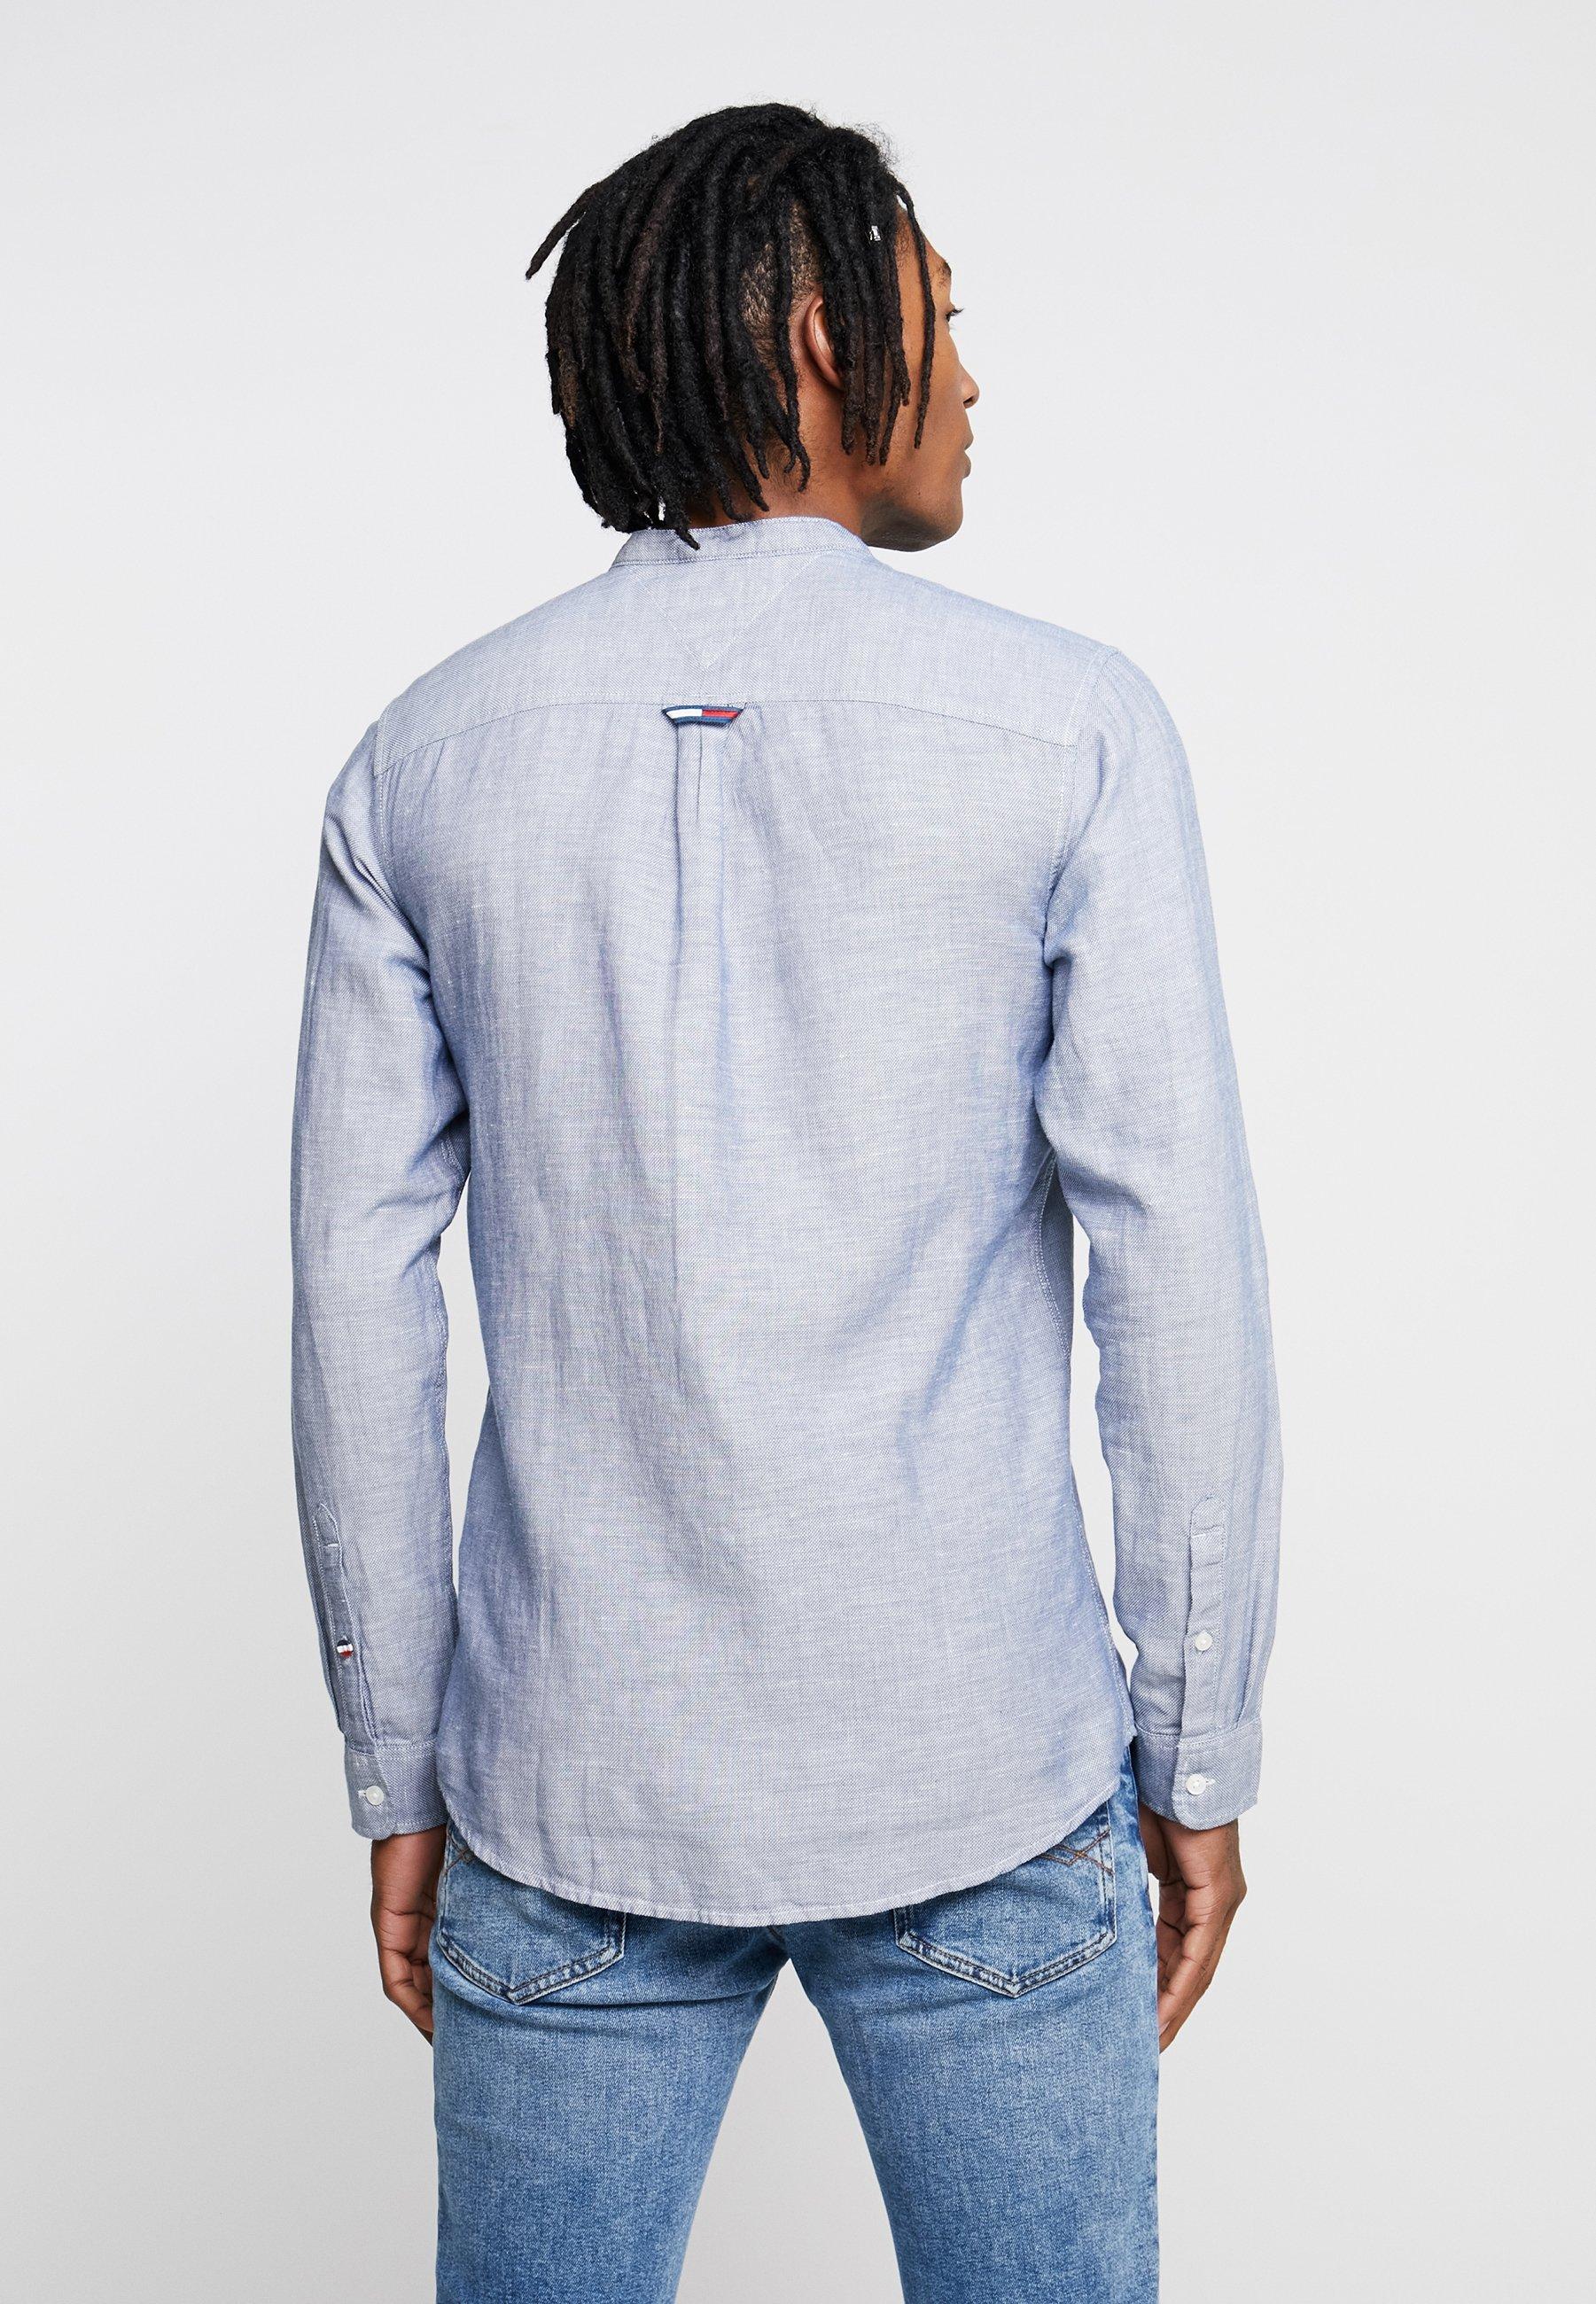 ShirtChemise Tommy Jeans Blue Tjm Mao Linen CtQhrsd